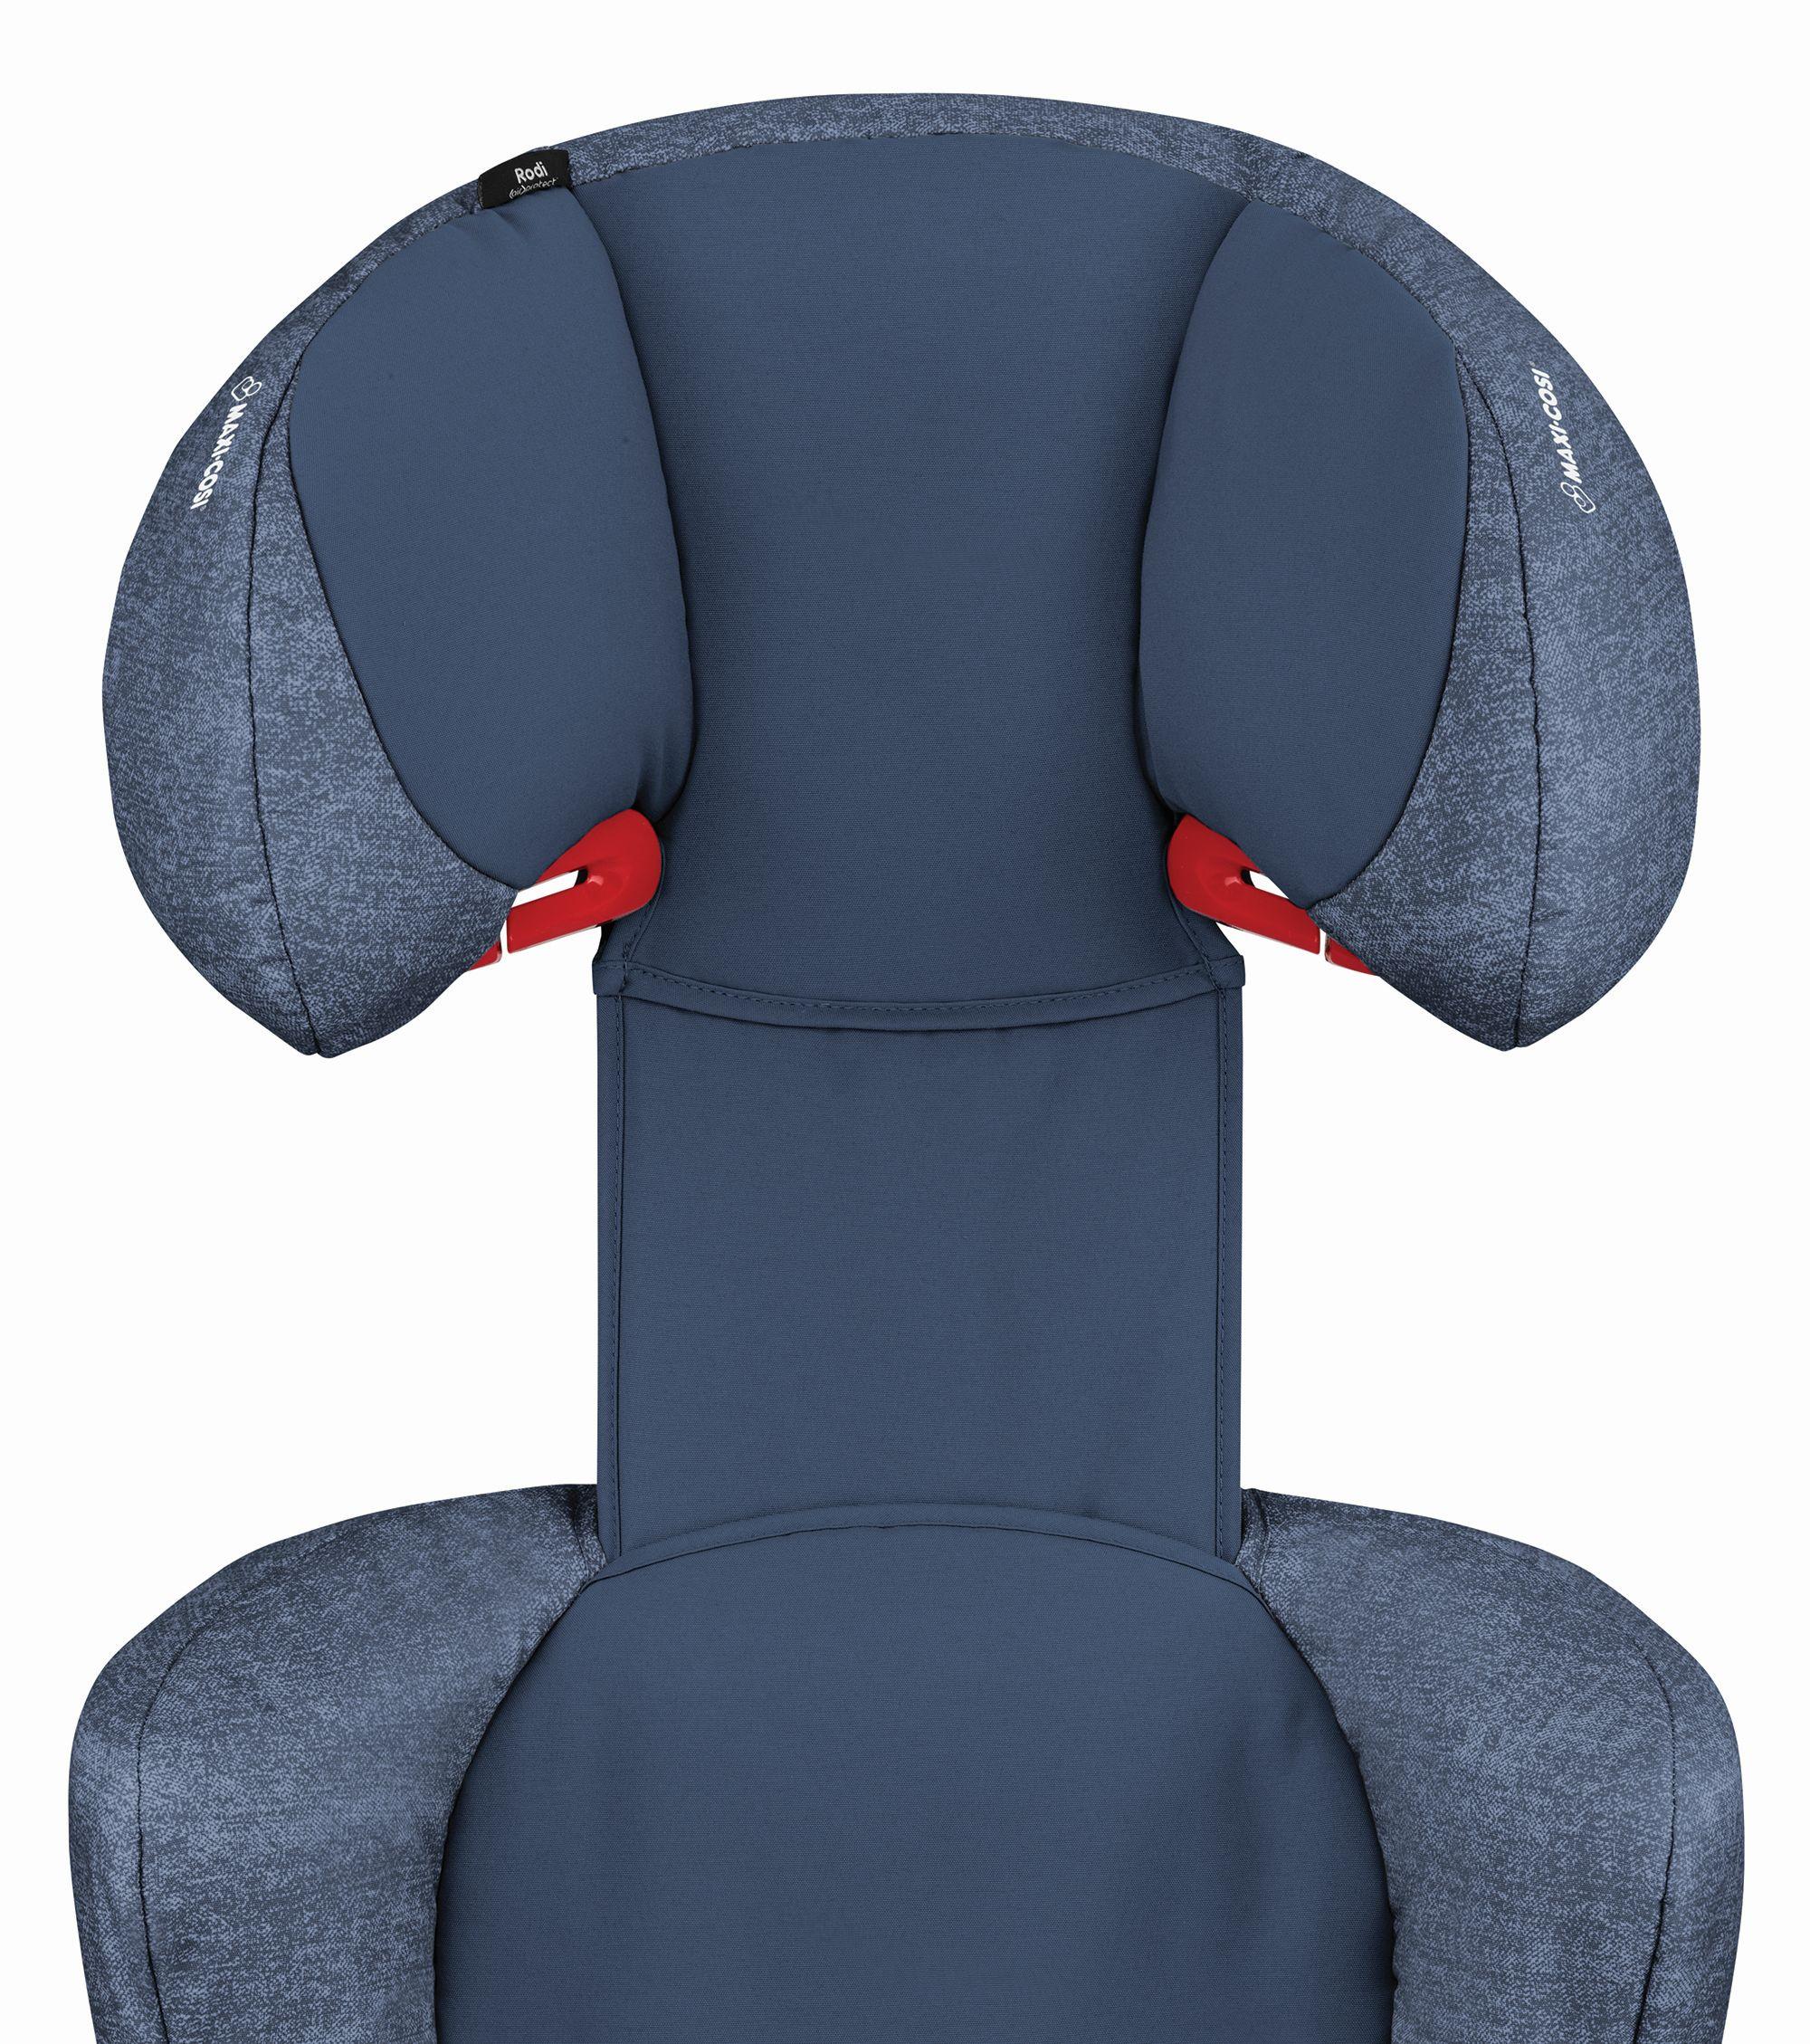 maxi cosi child car seat rodi air protect 2018 nomad blue. Black Bedroom Furniture Sets. Home Design Ideas